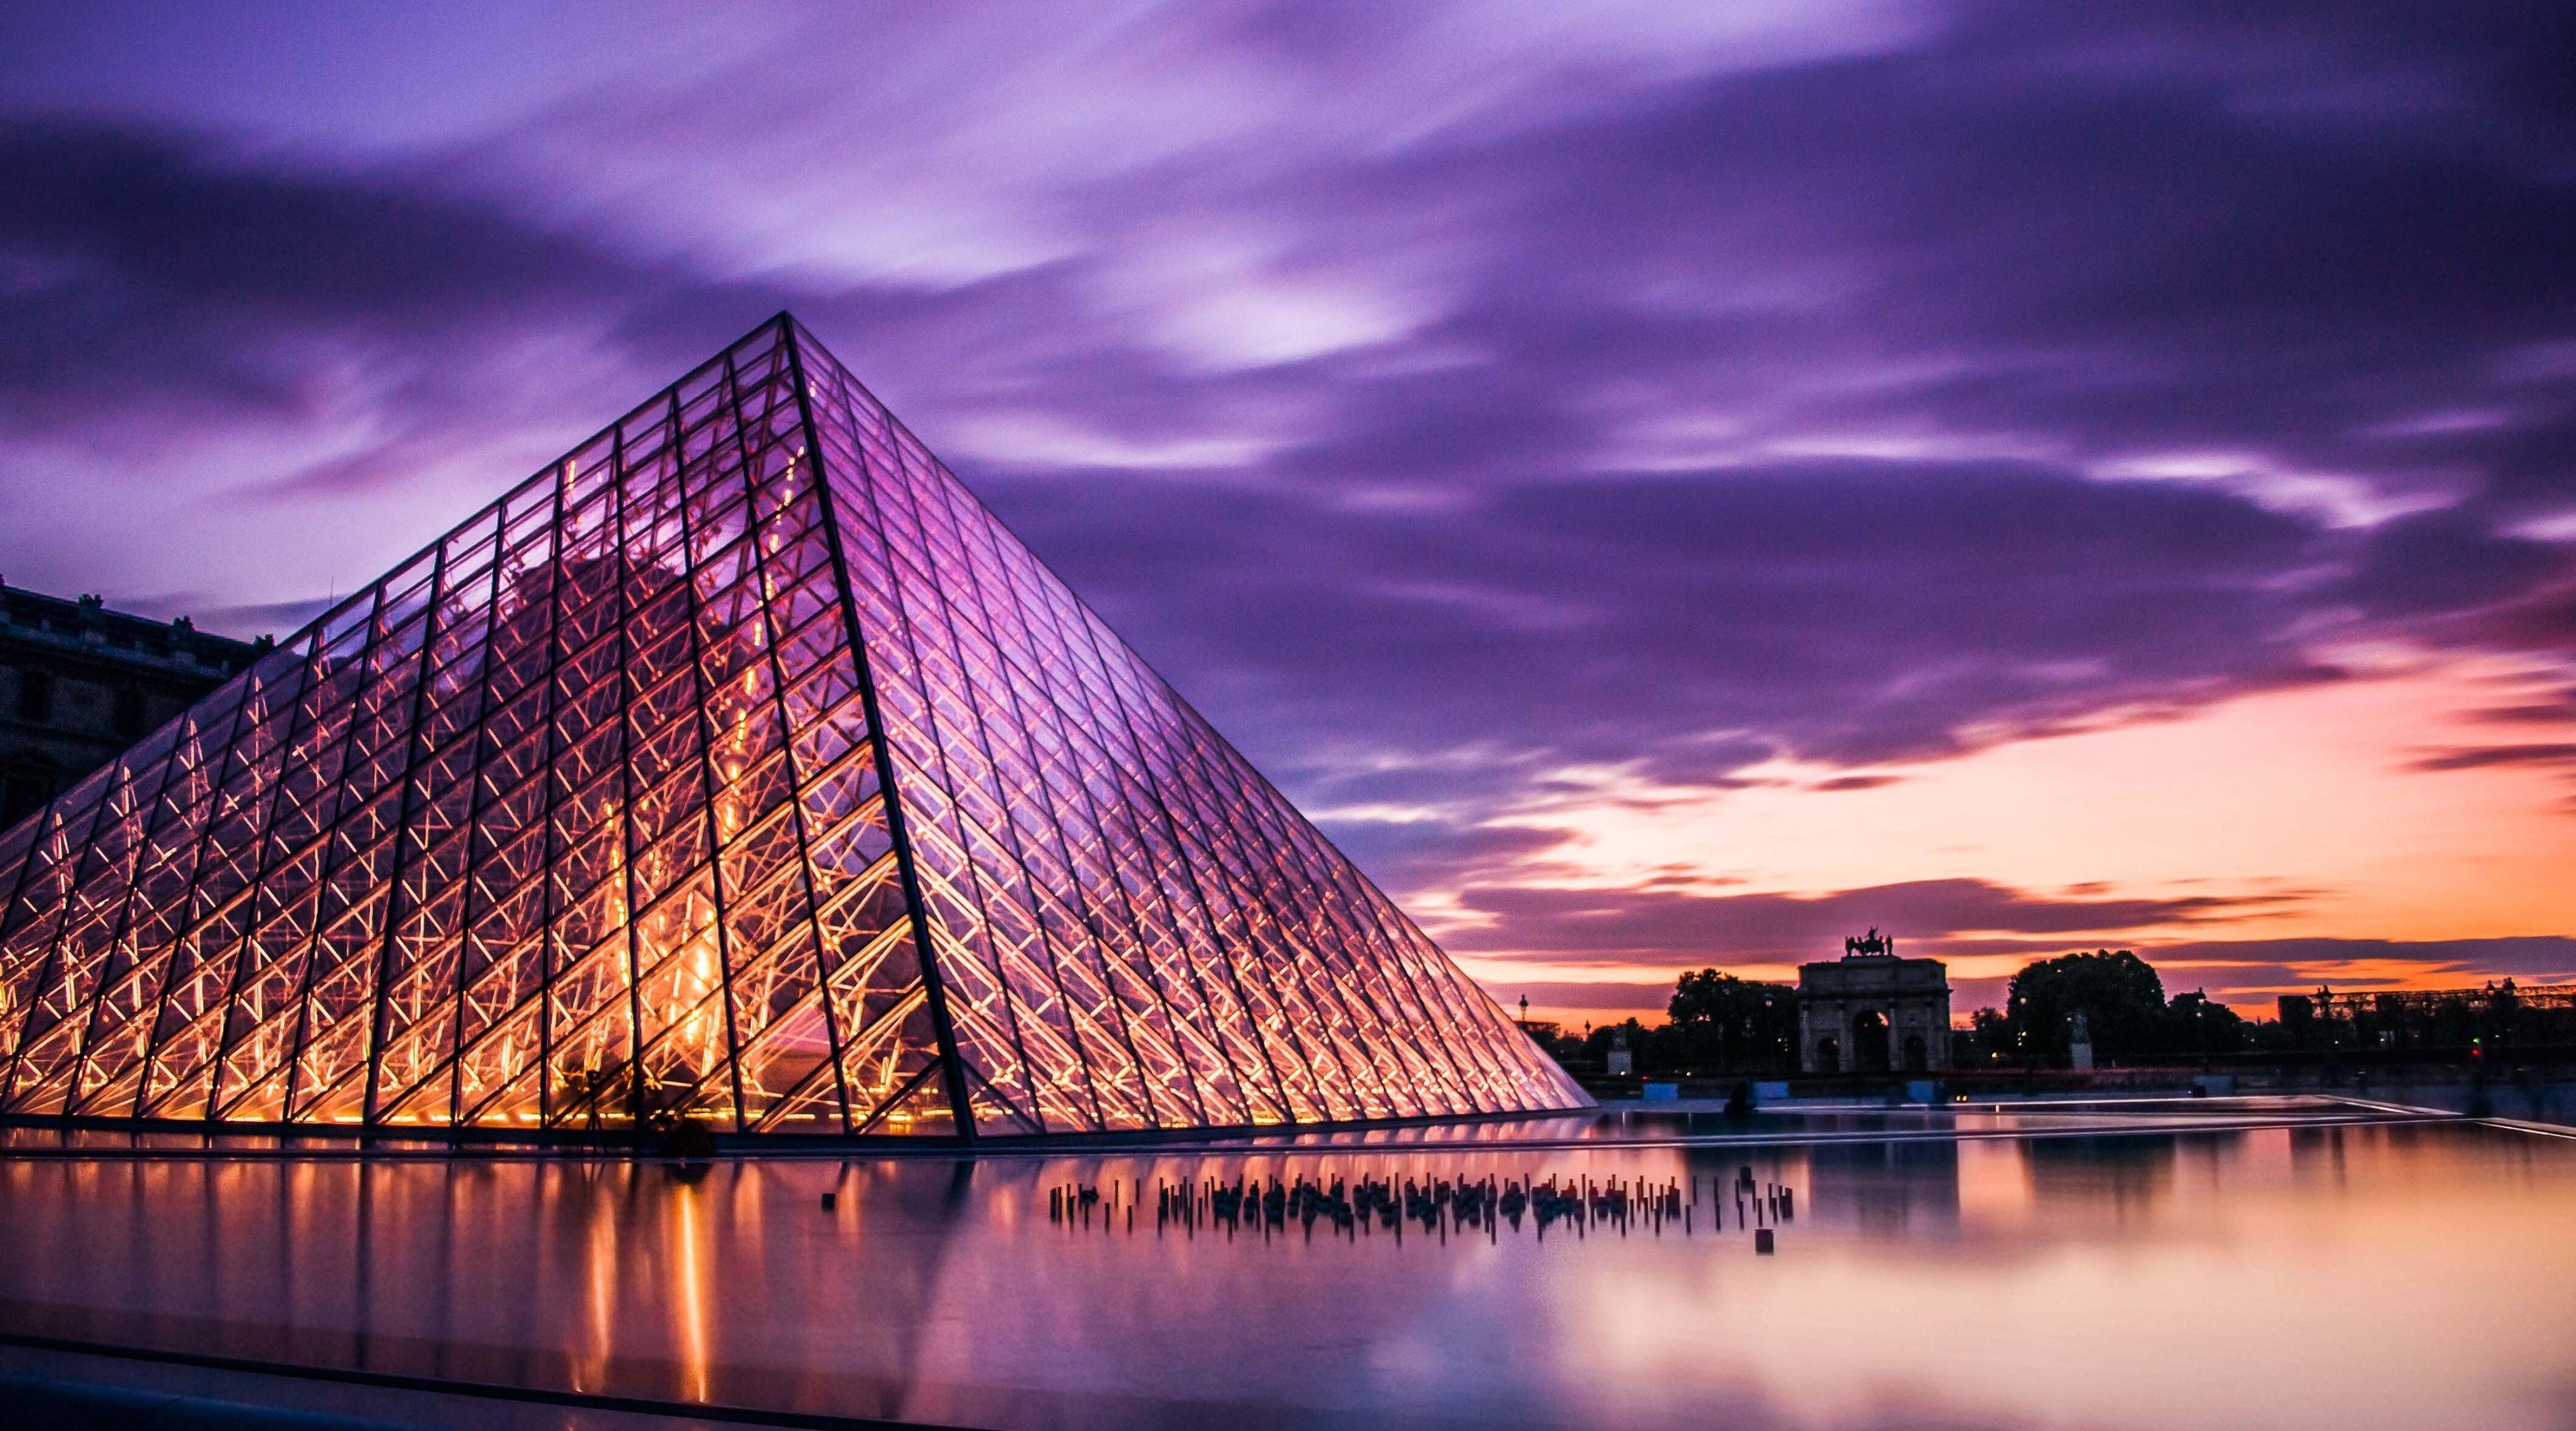 3840x2133 Louvre 4k Hd Wallpaper For Desktop Paris France Travel France Travel City Travel